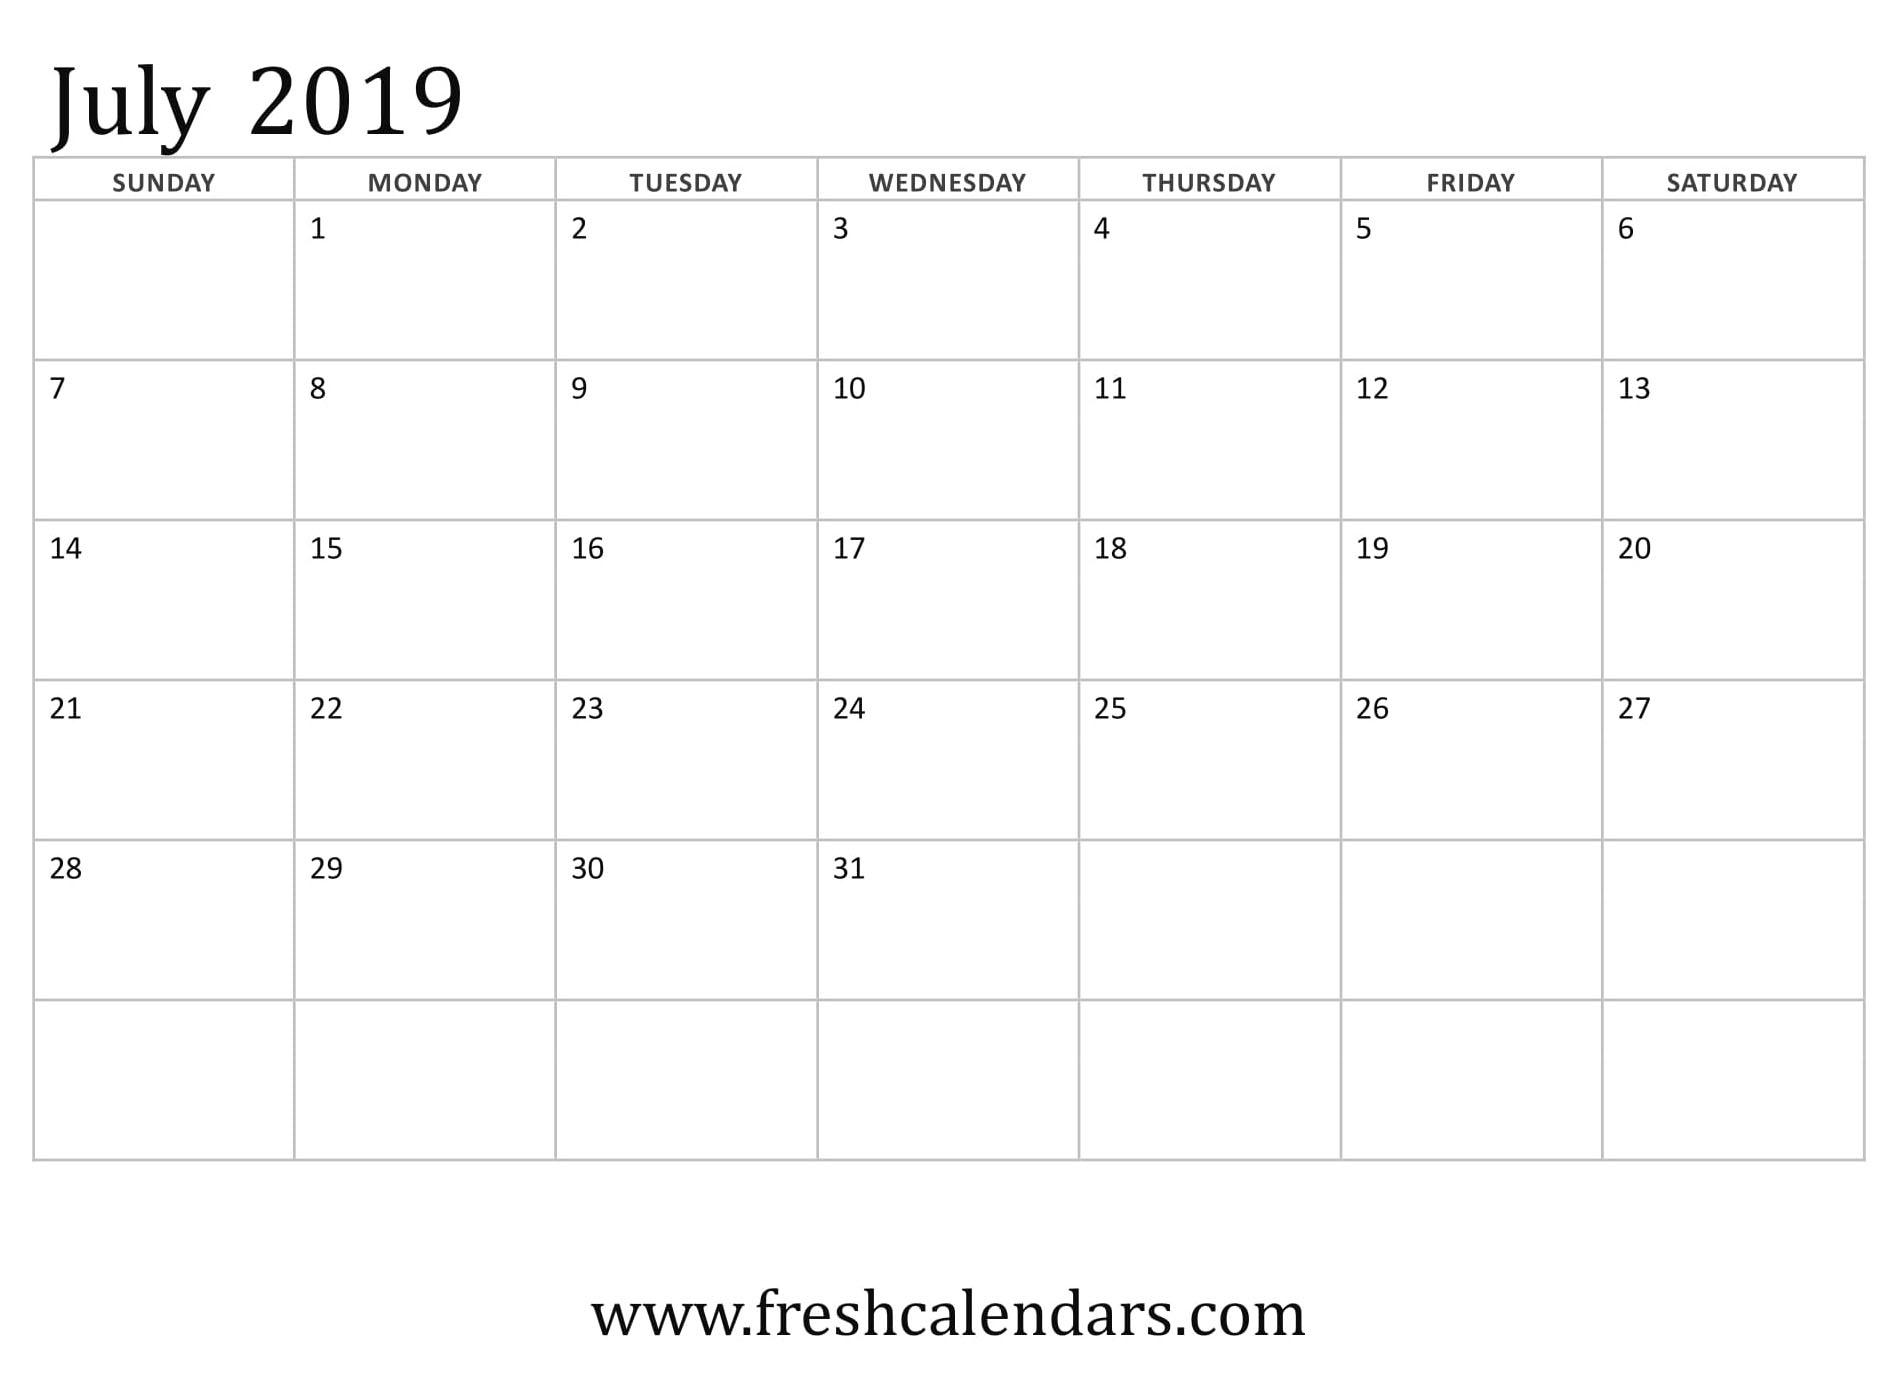 July 2019 Calendar Printable Templates